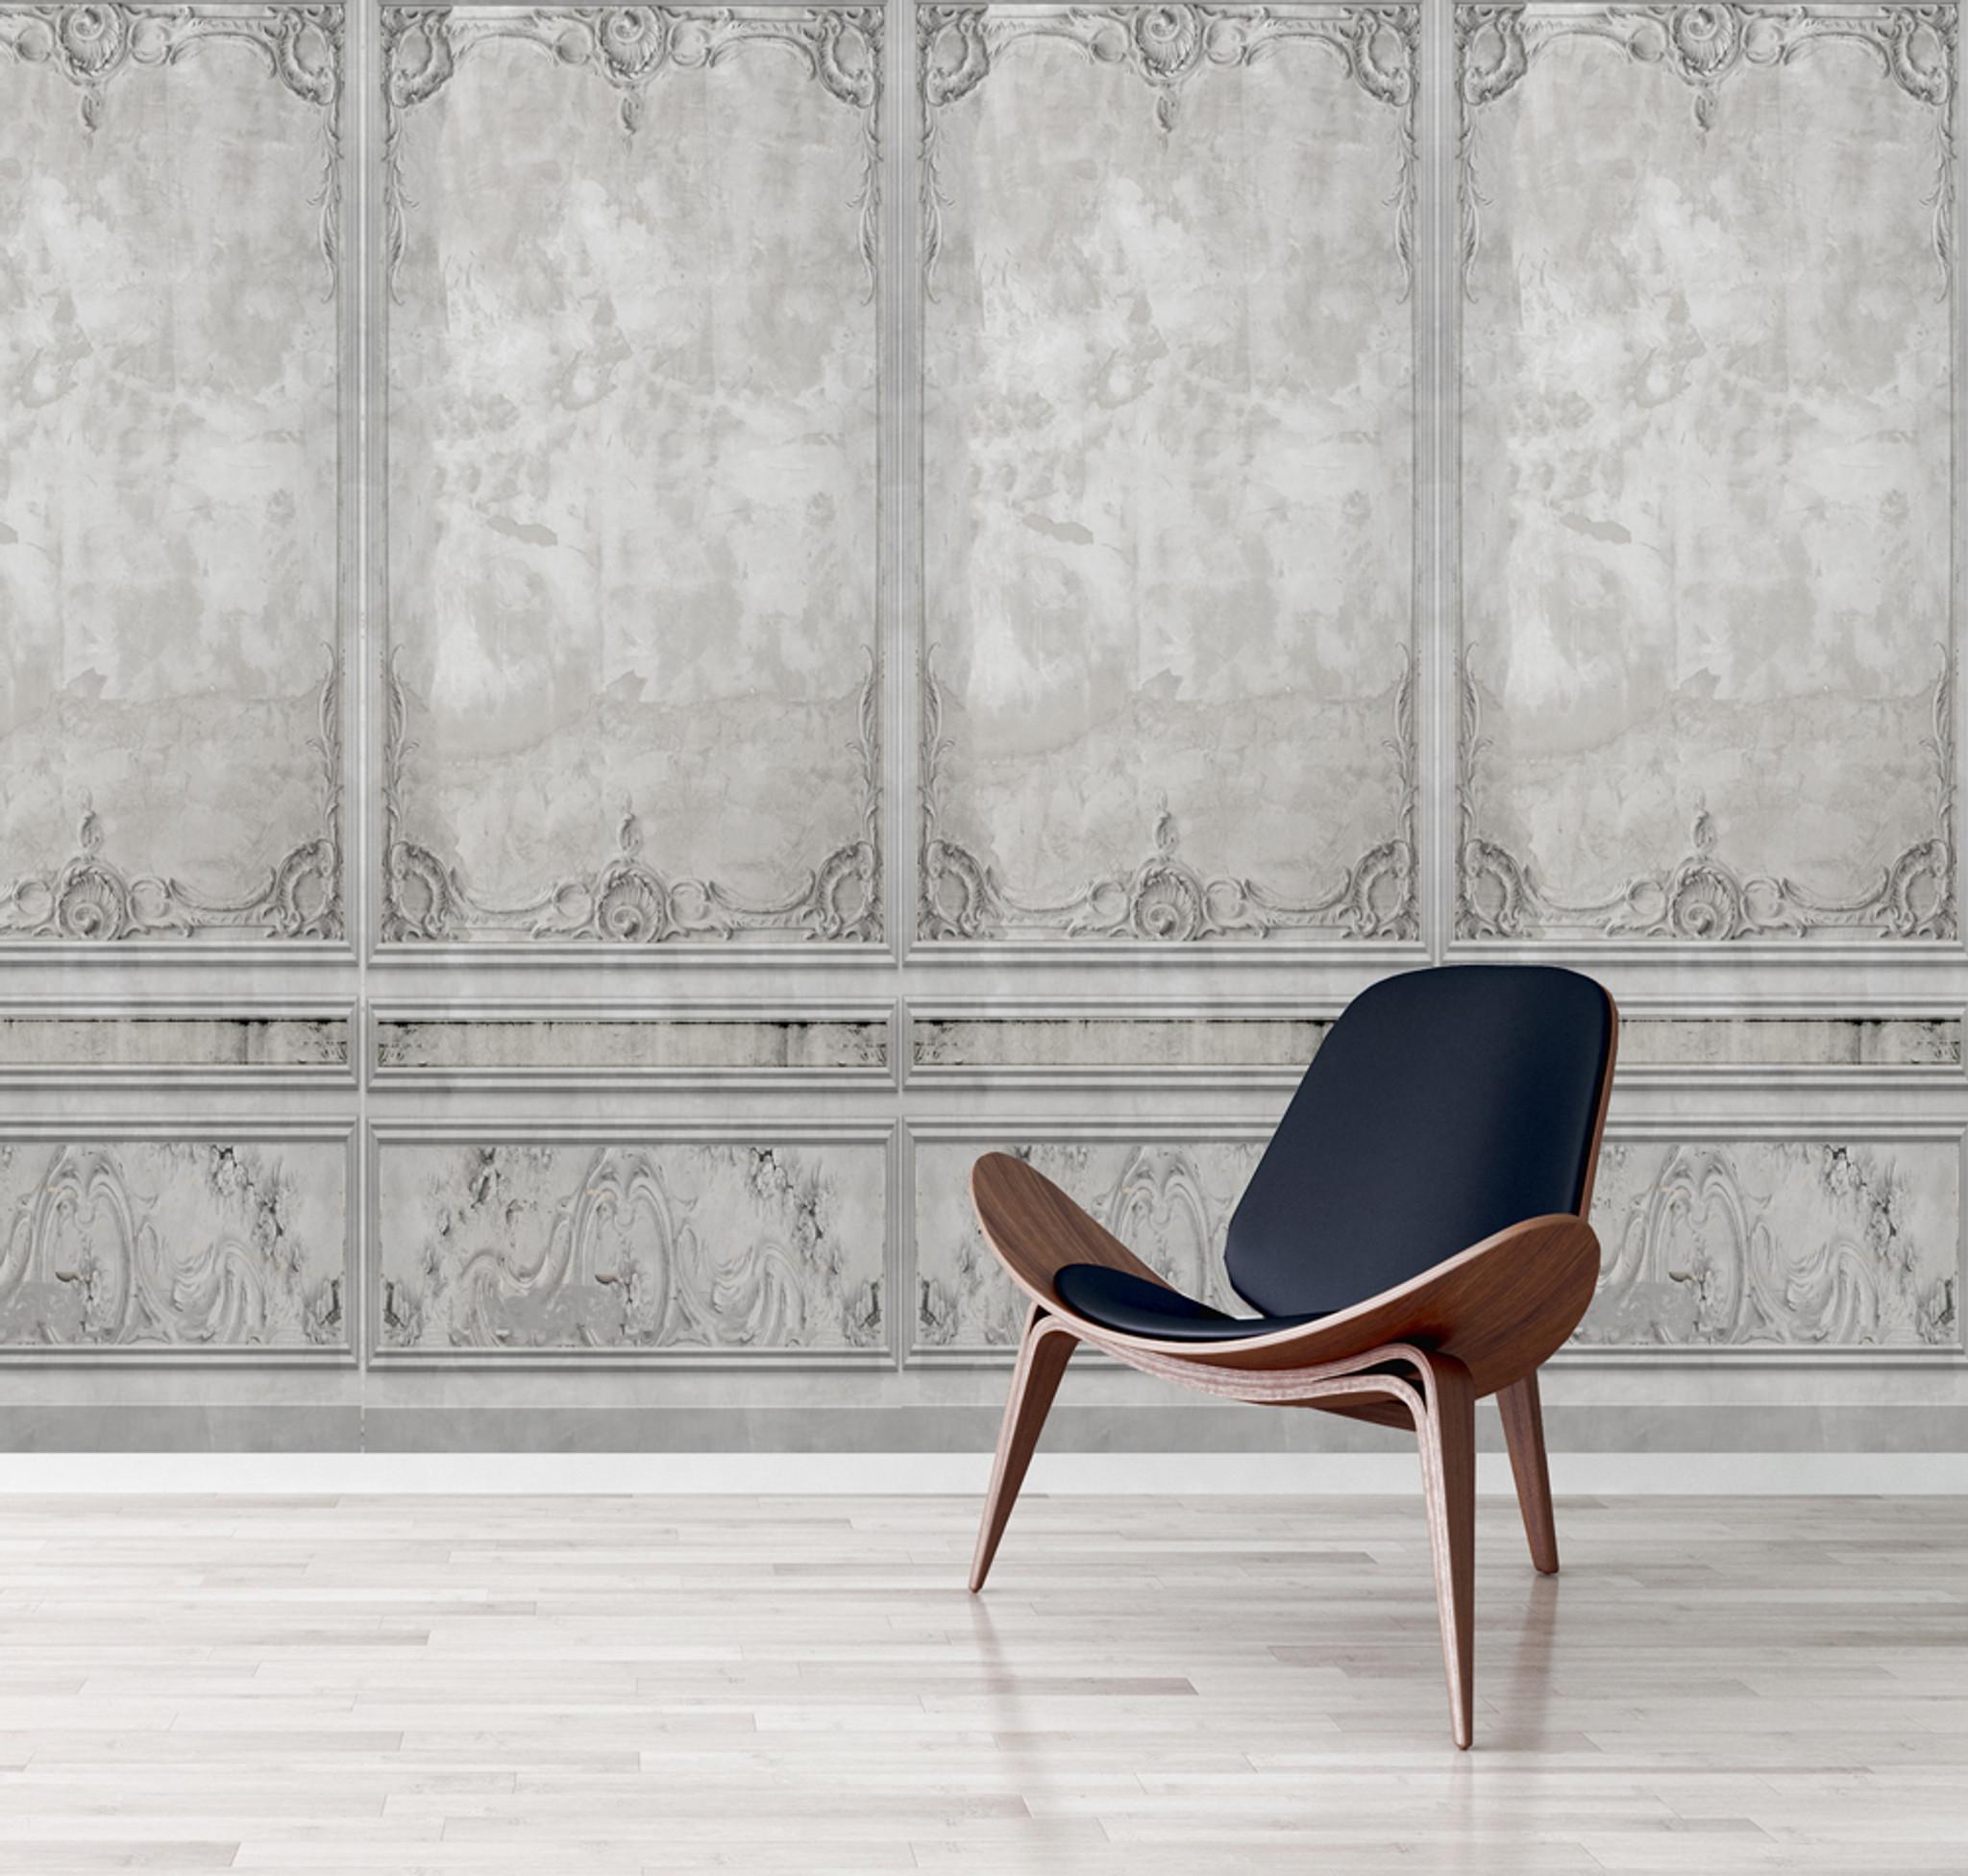 Wallpaper - Architect Series - Decorative Plaster Wall